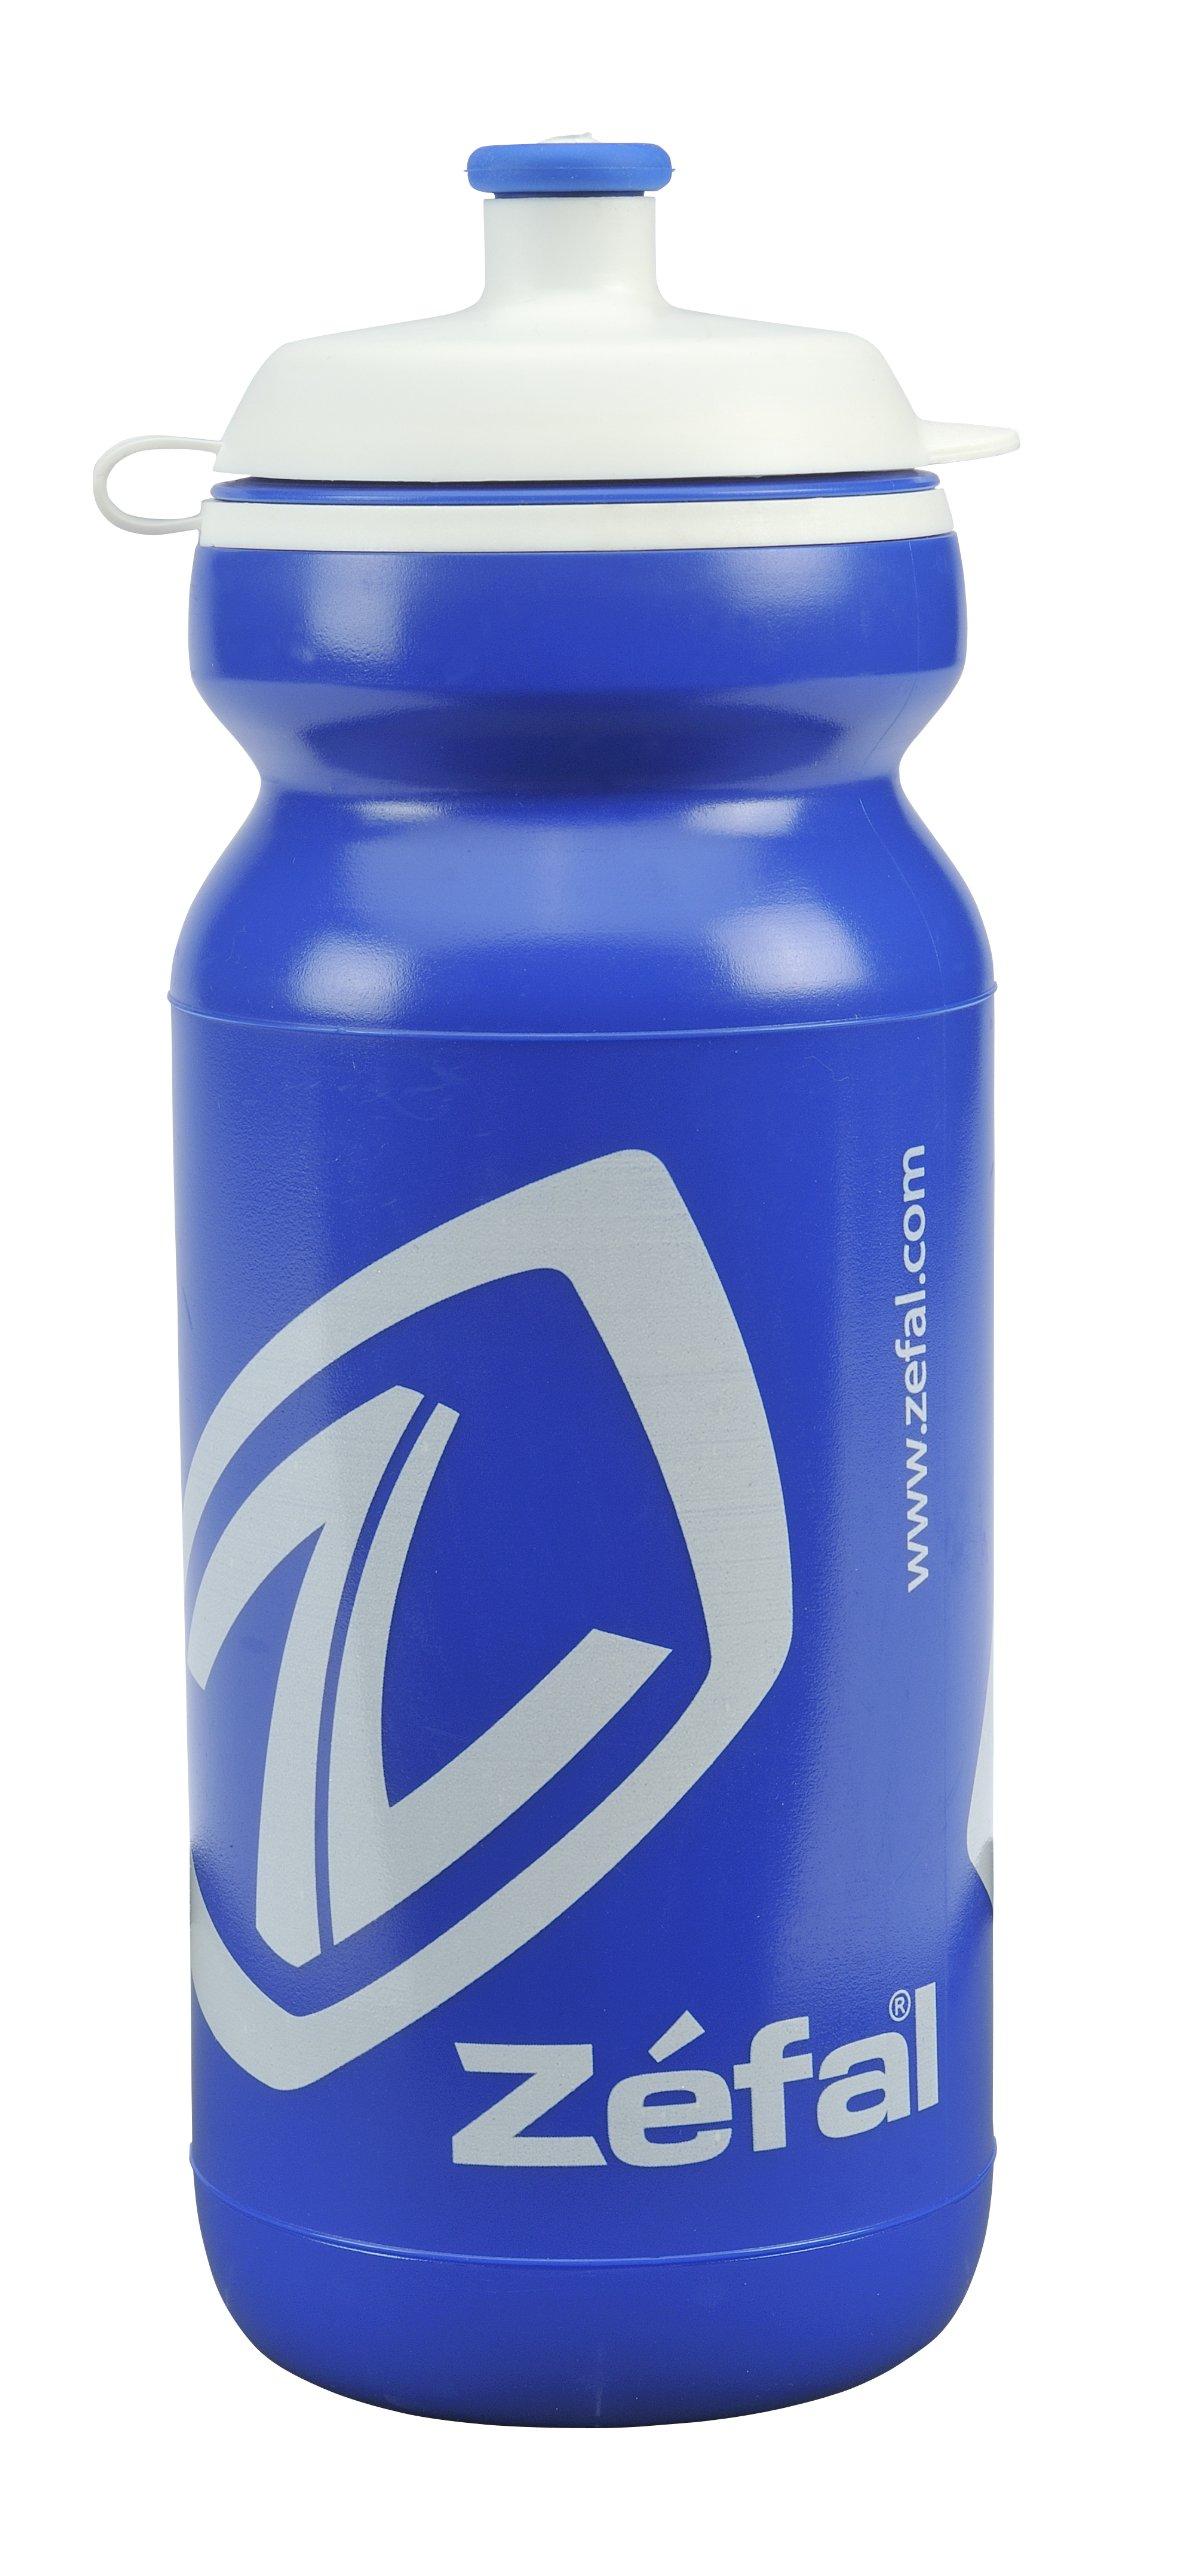 Zefal Premier Borraccia, Blu, 600 ml